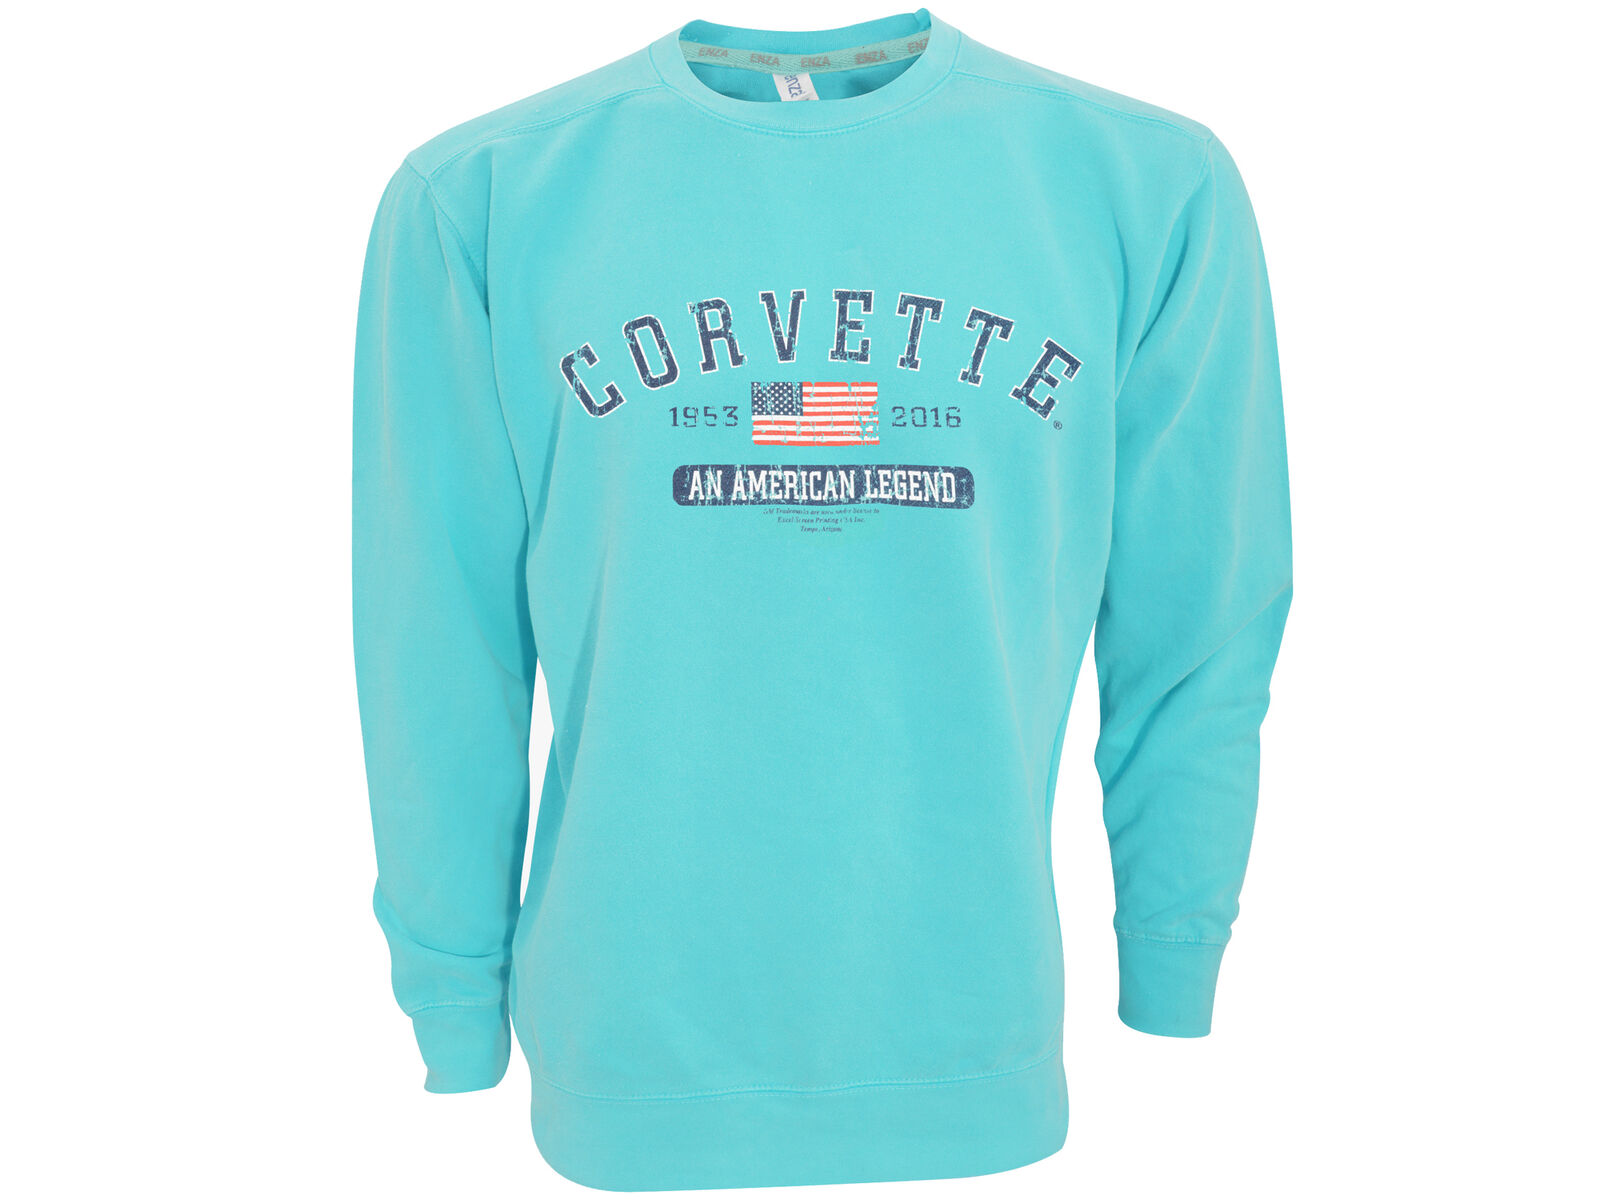 Corvette Seaglass bluee American Legend Ladies Sweatshirt